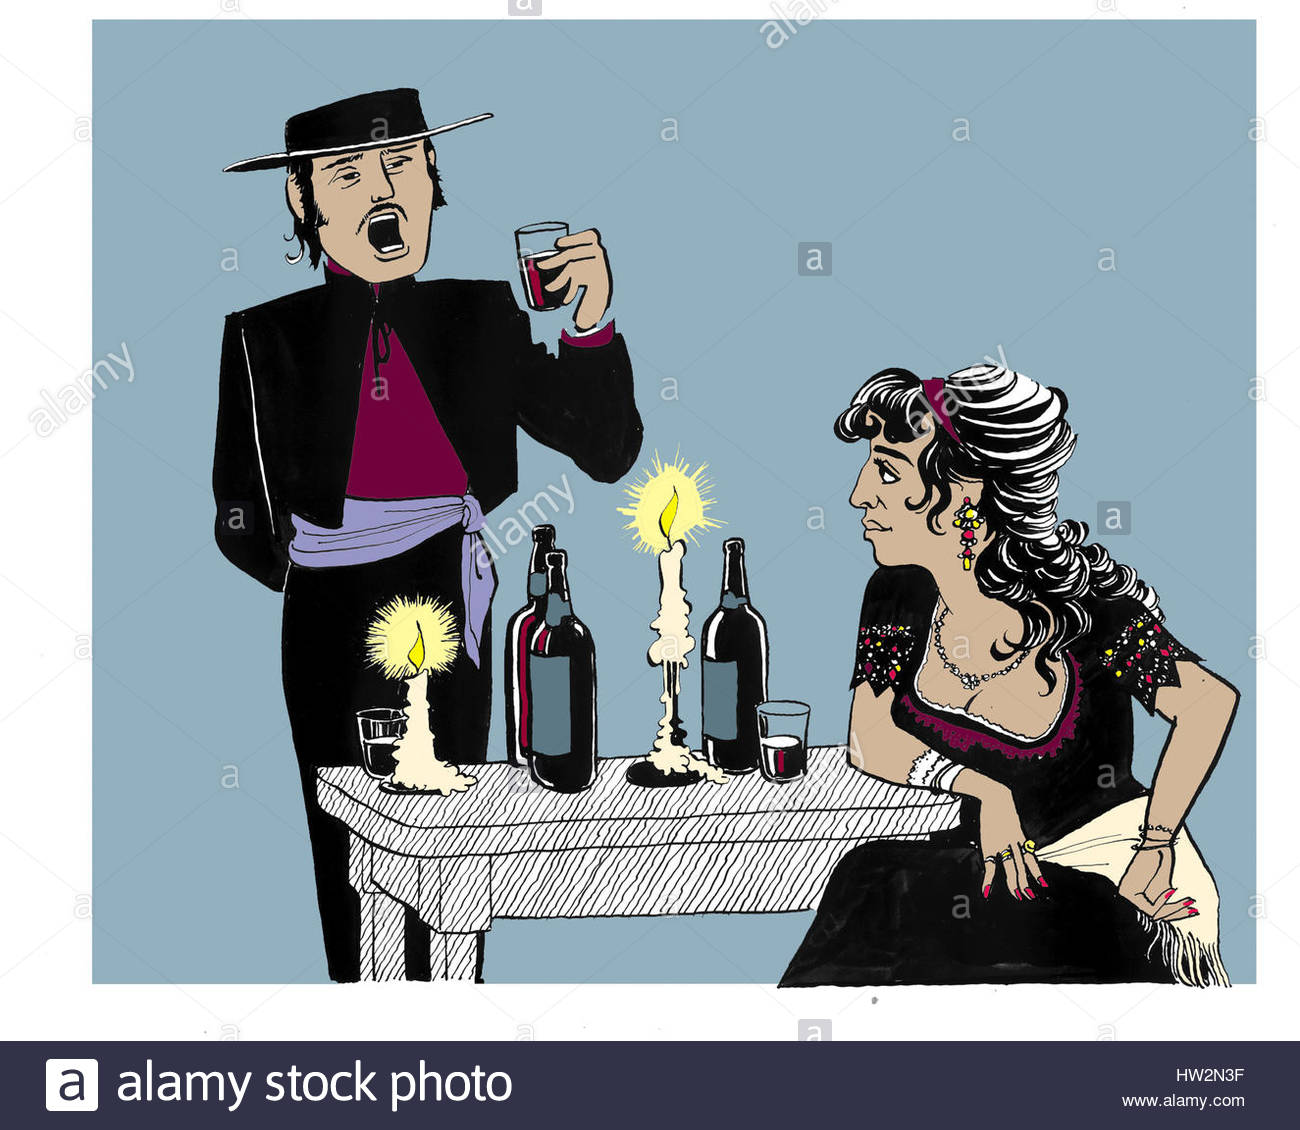 scene from bizet s opera carmen dinner scene with don jose and